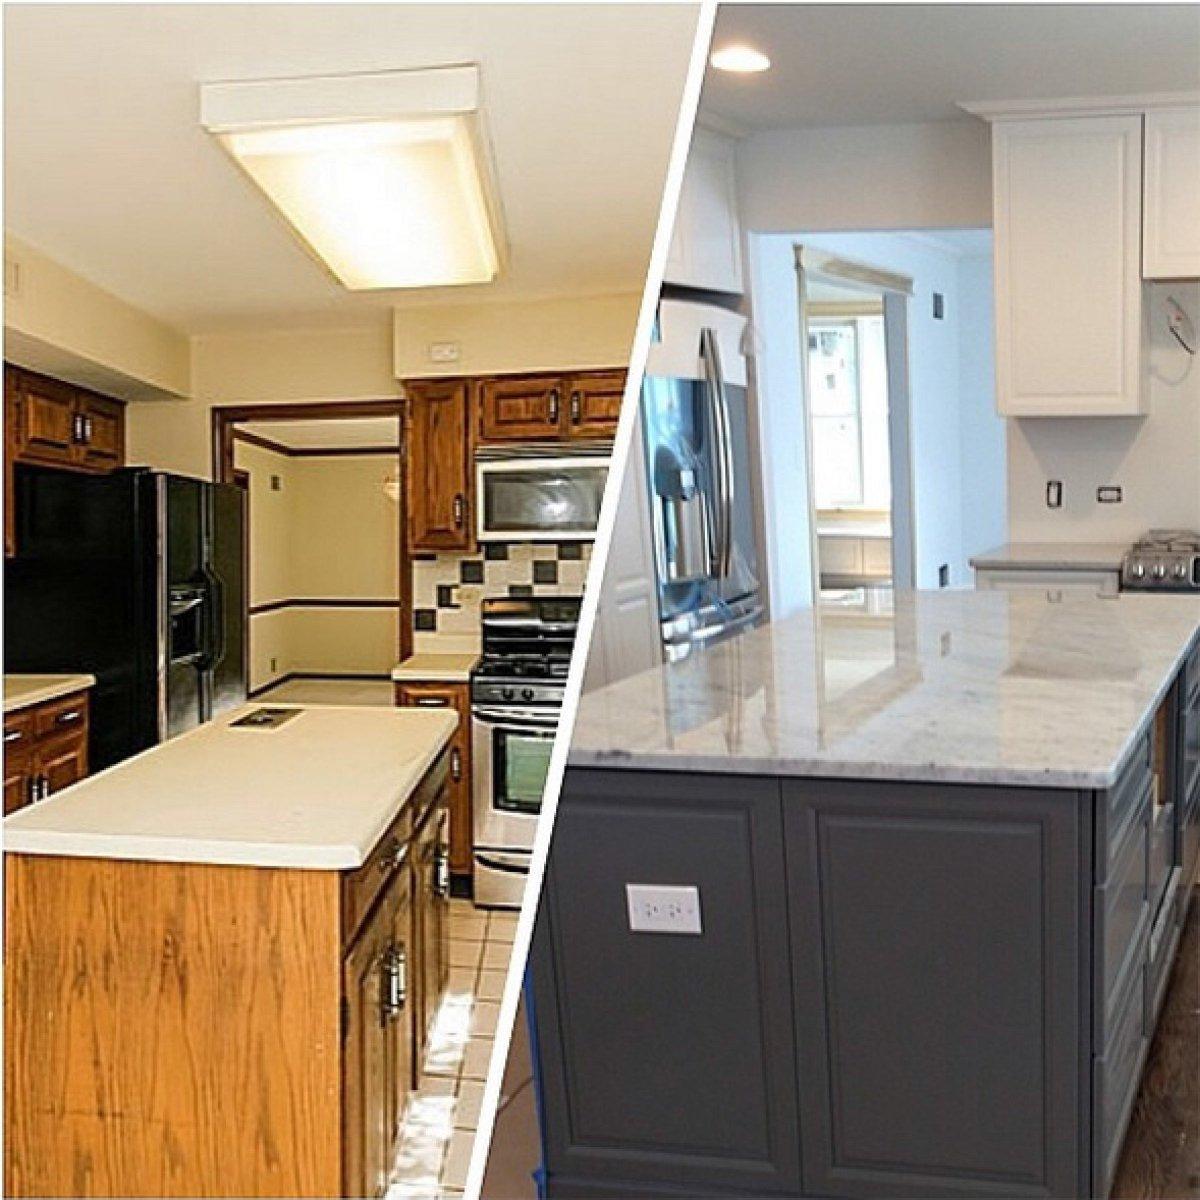 Kraftmaid White Kitchen Cabinets: KraftMaid Cabinetry (@KraftMaid)